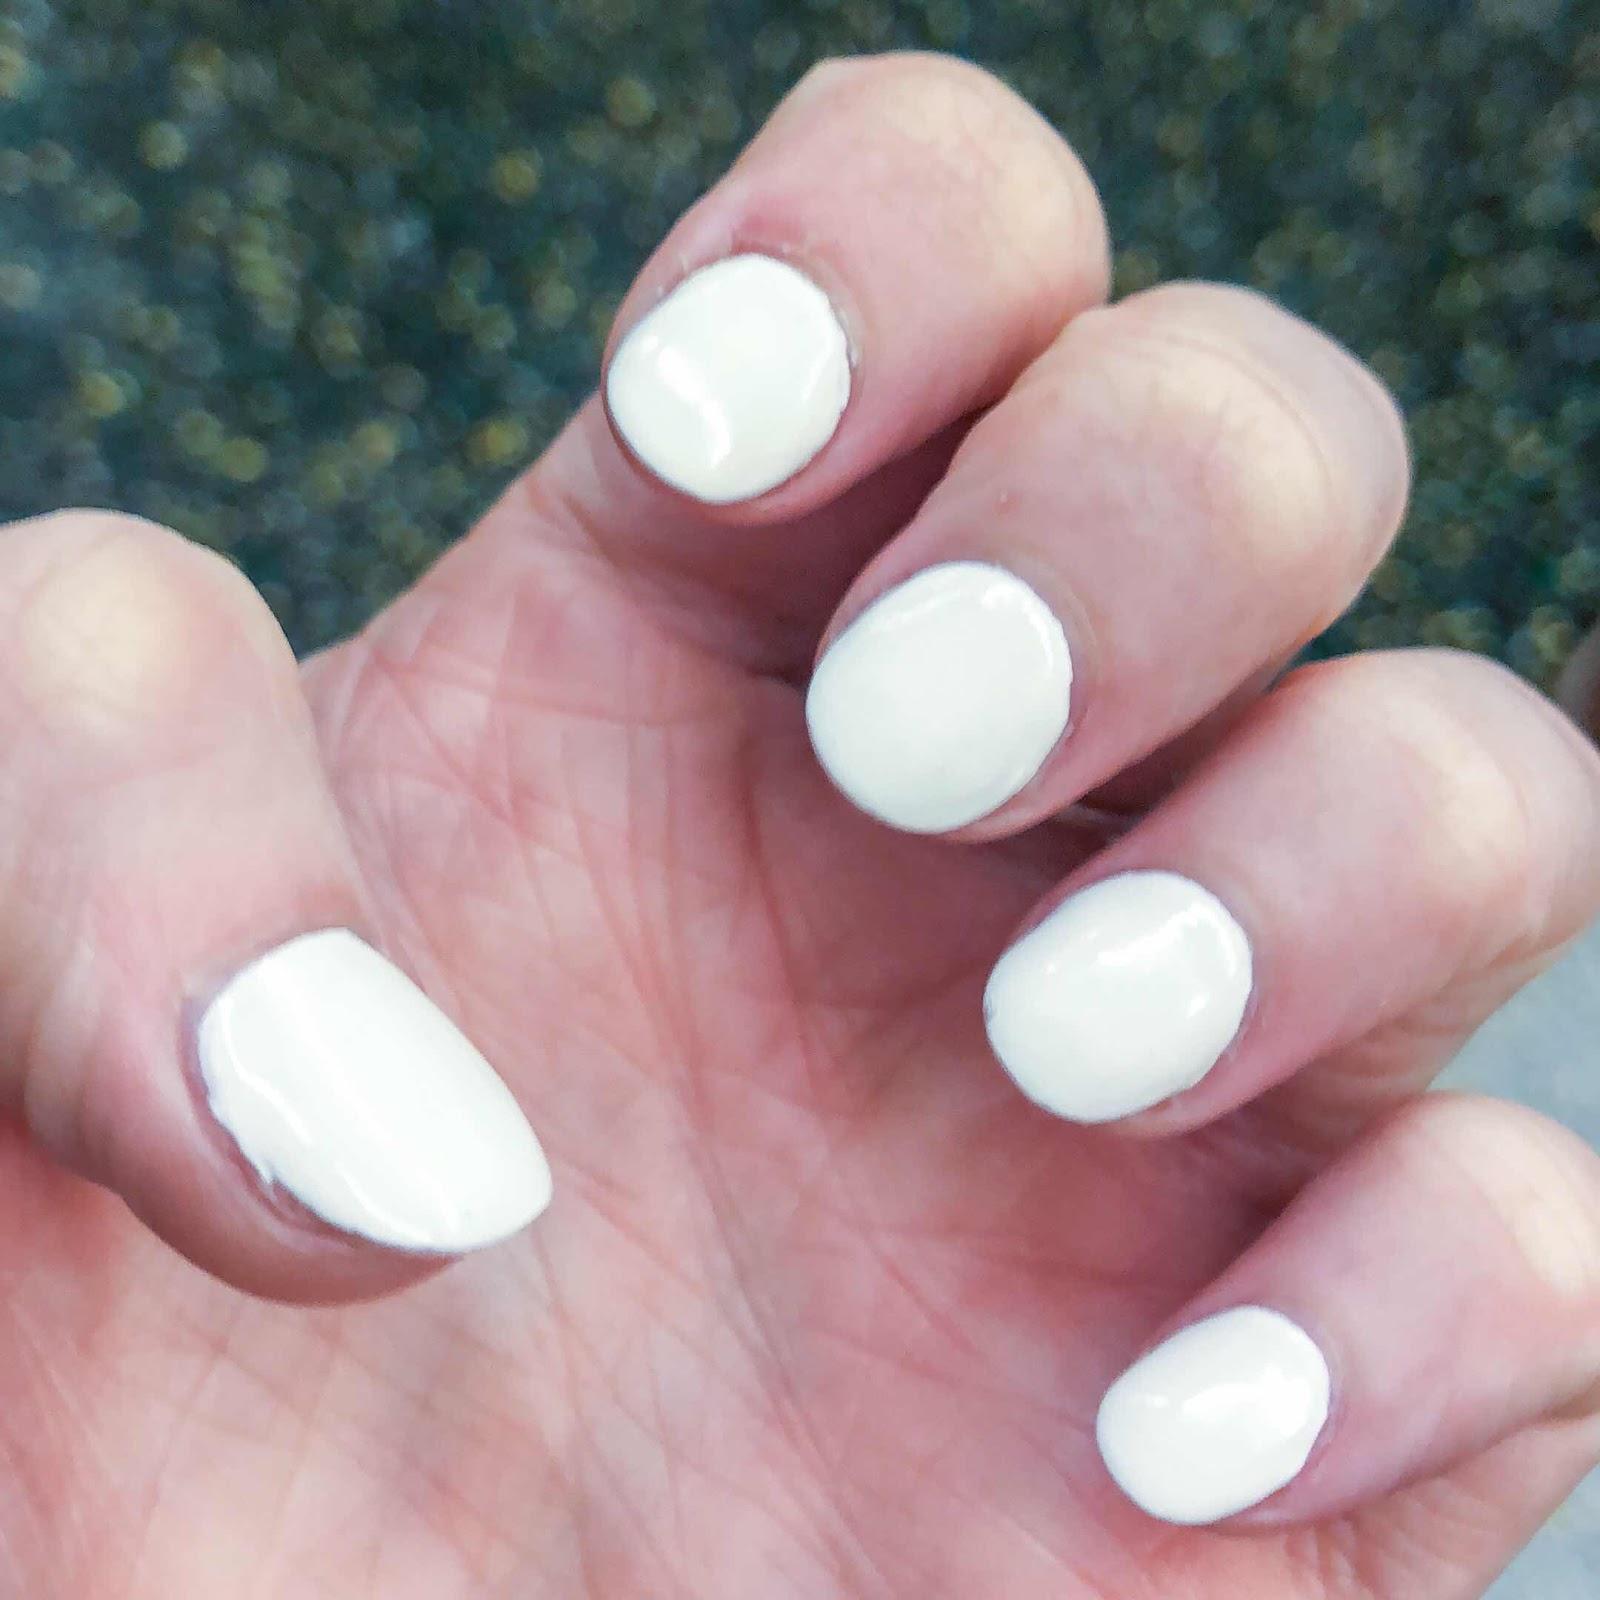 beauty-blog-white-nails-manicure